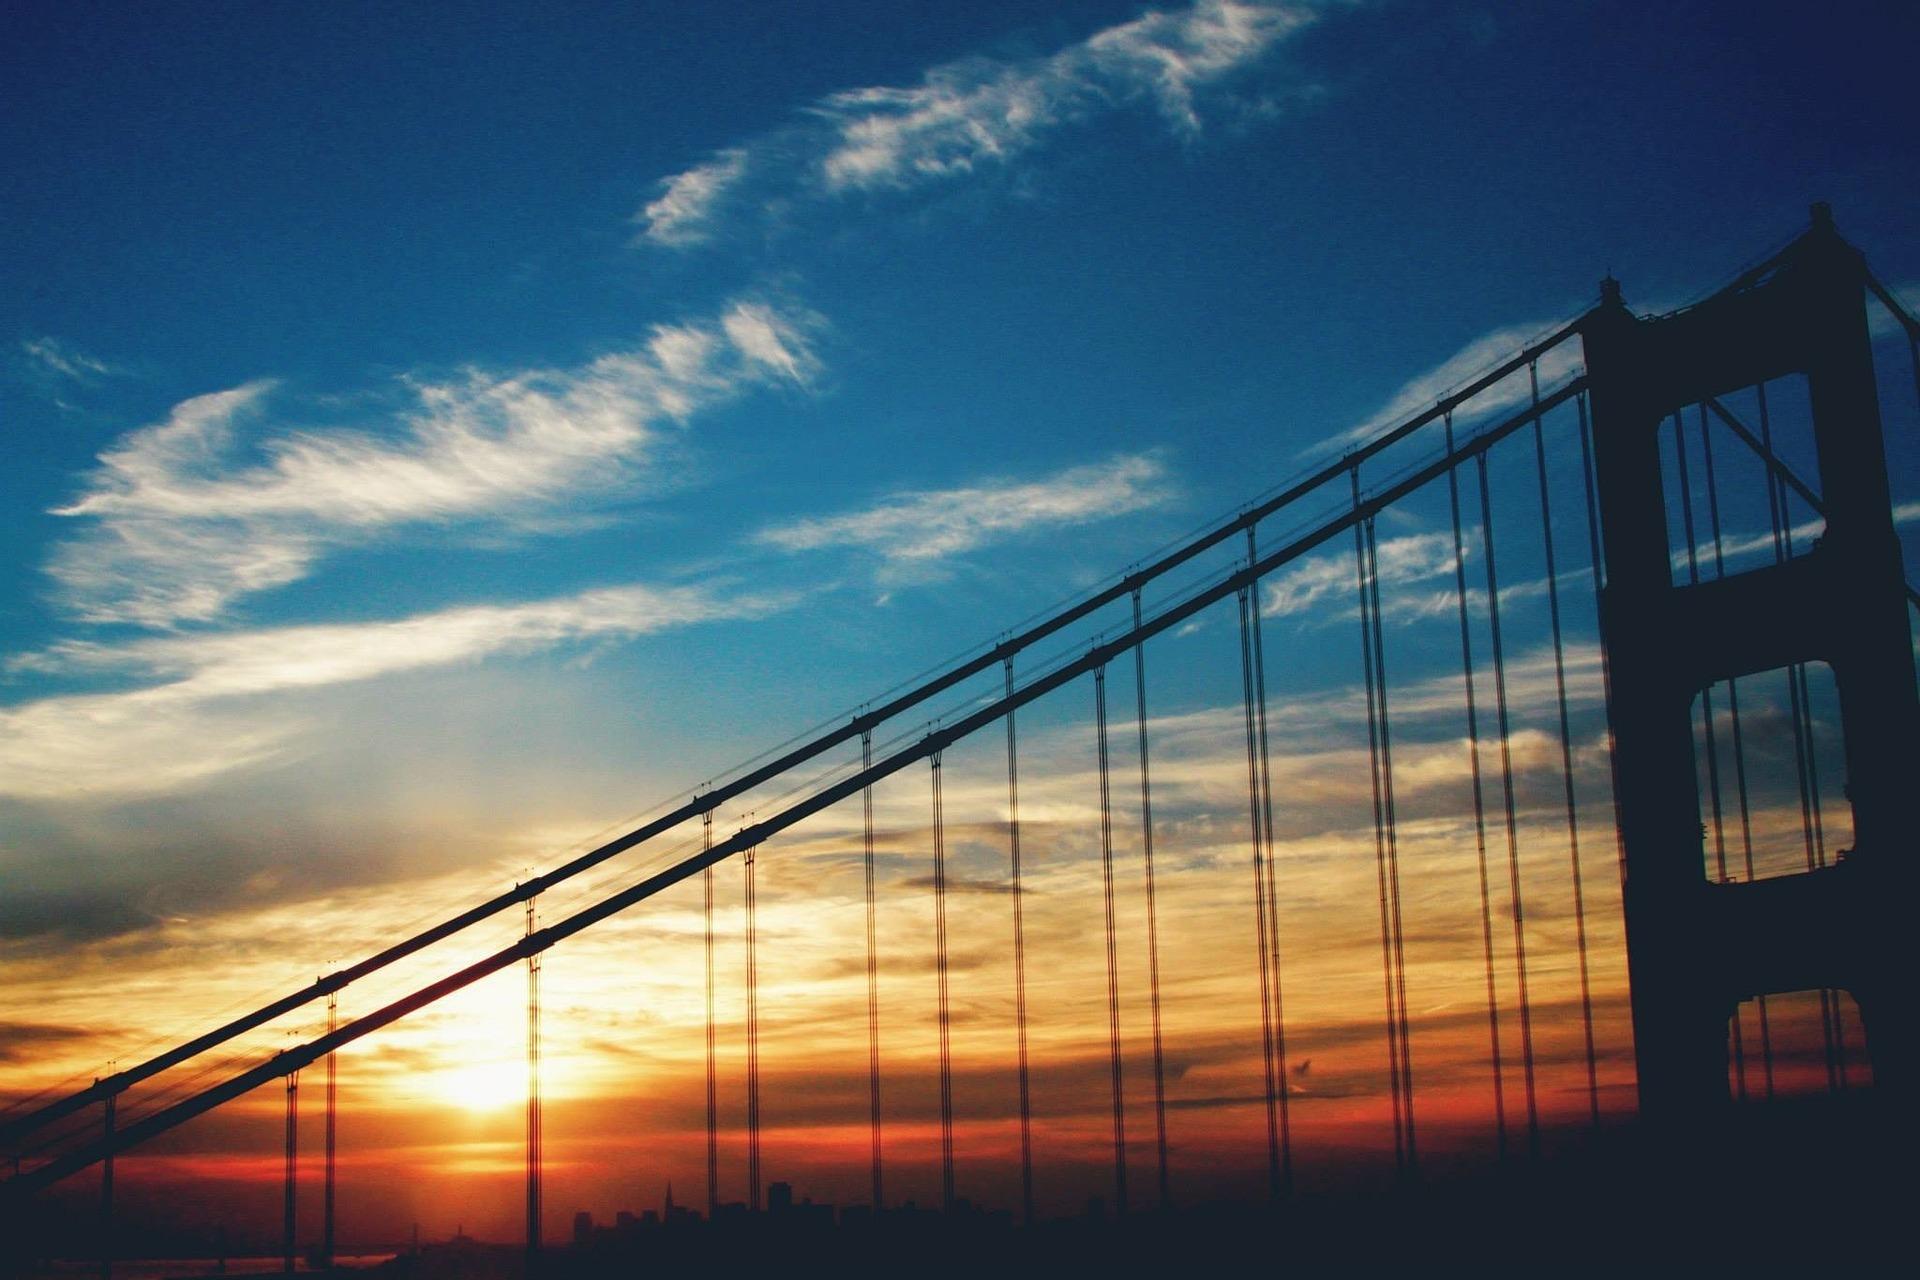 sunset-1209654_1920.jpg